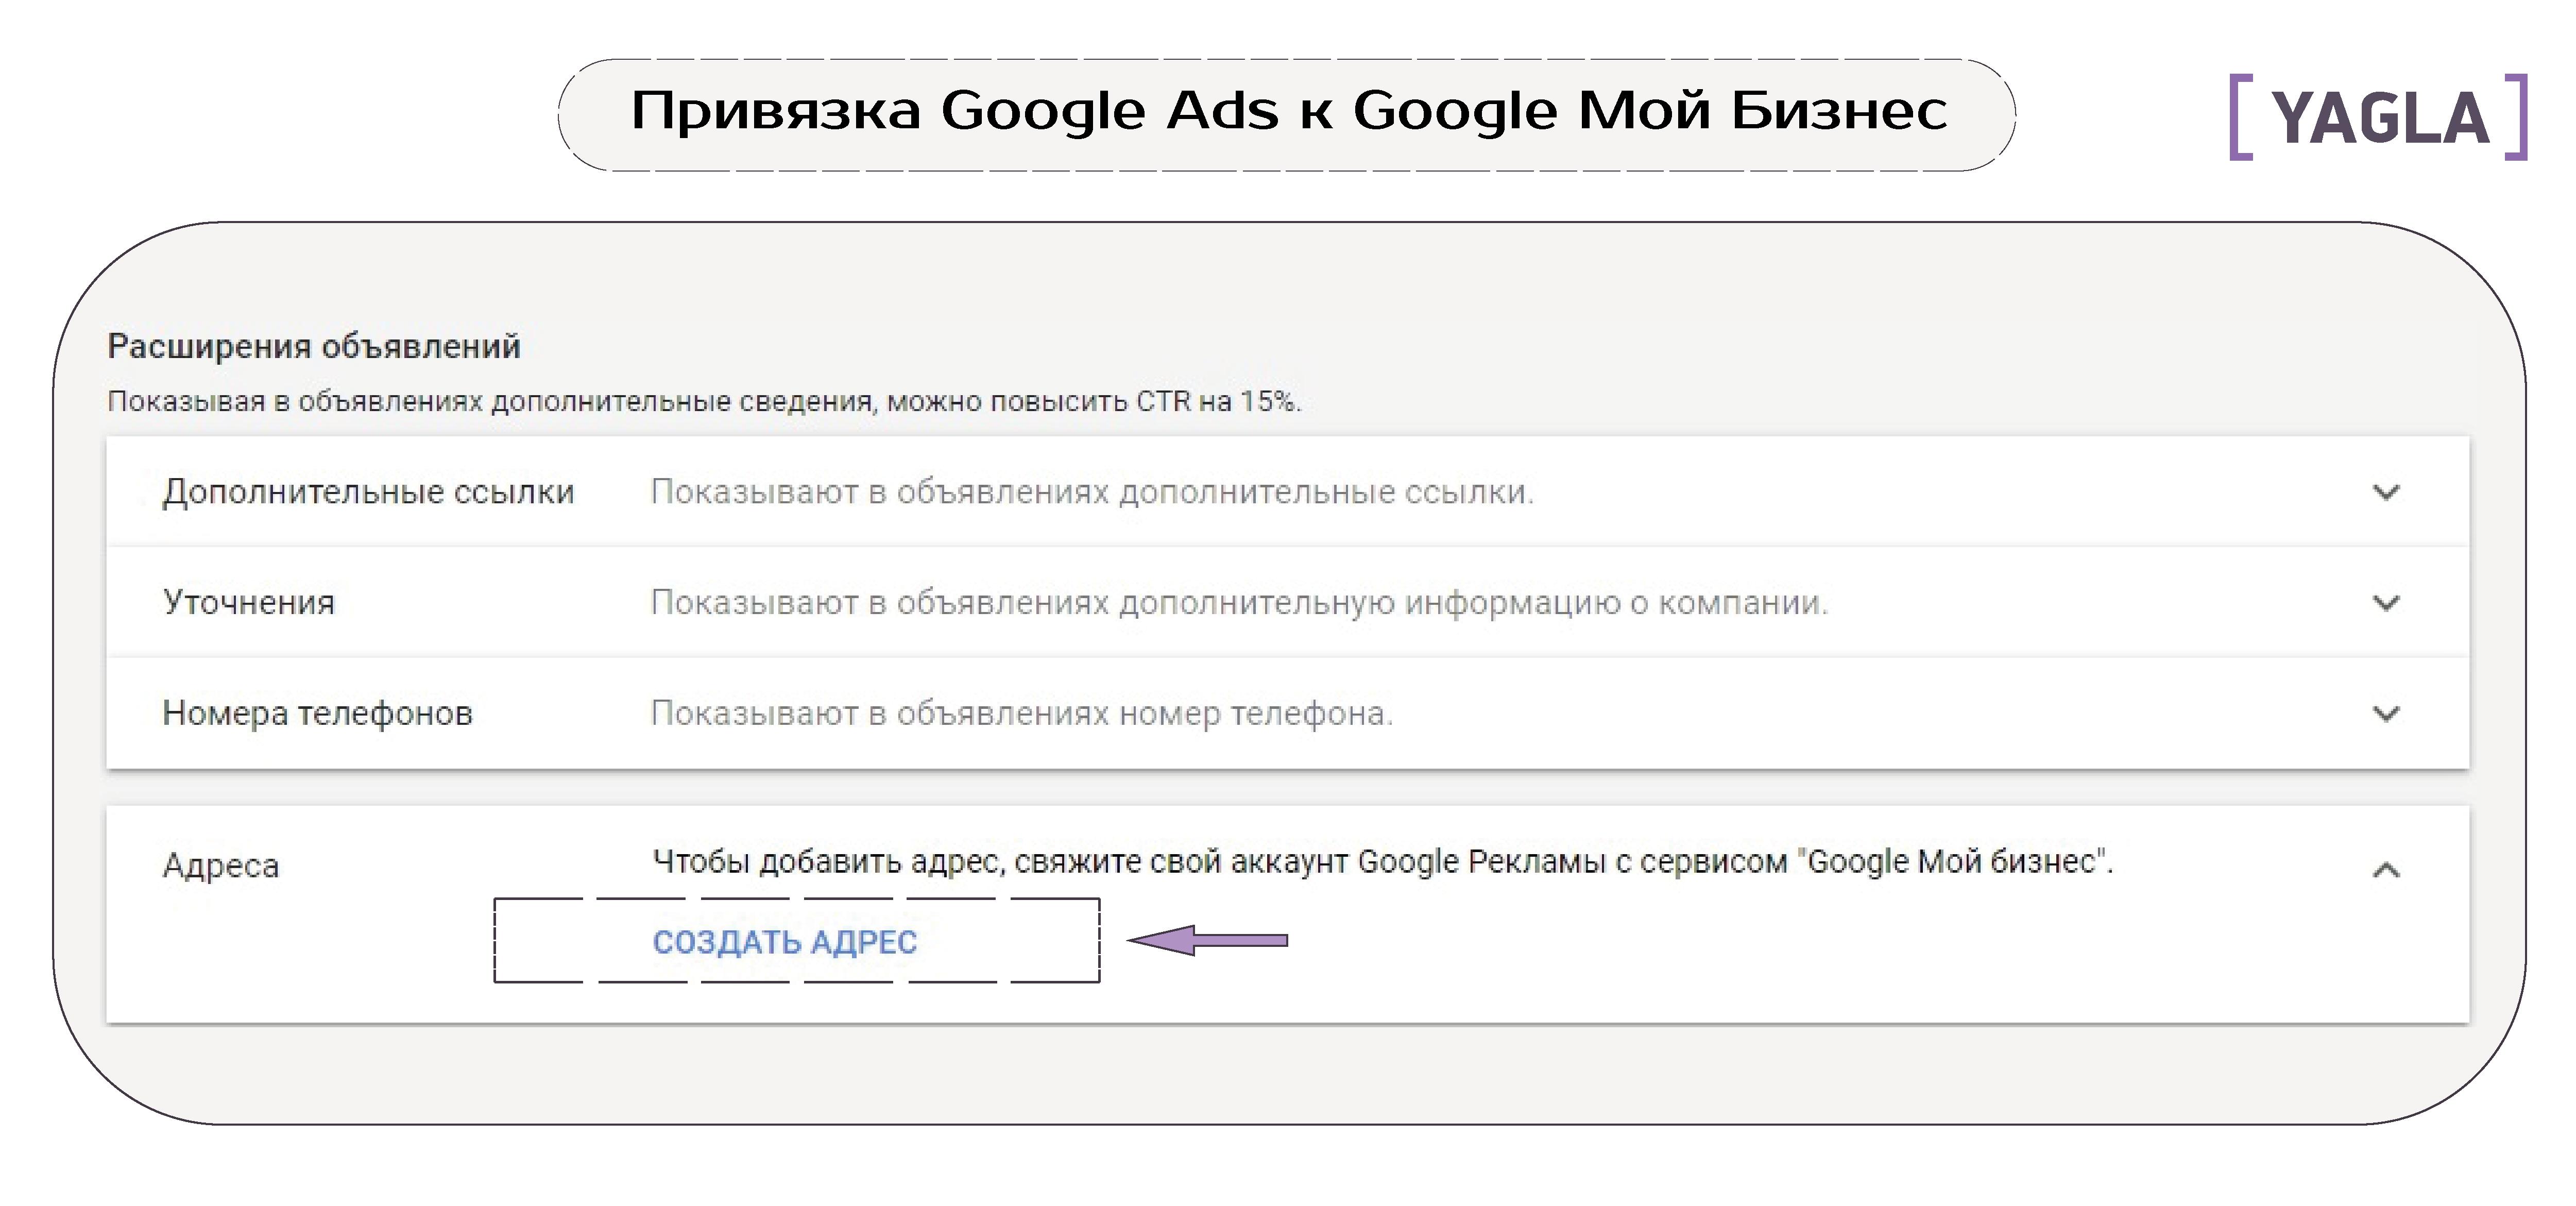 Привязка Google Ads к Google Мой Бизнес